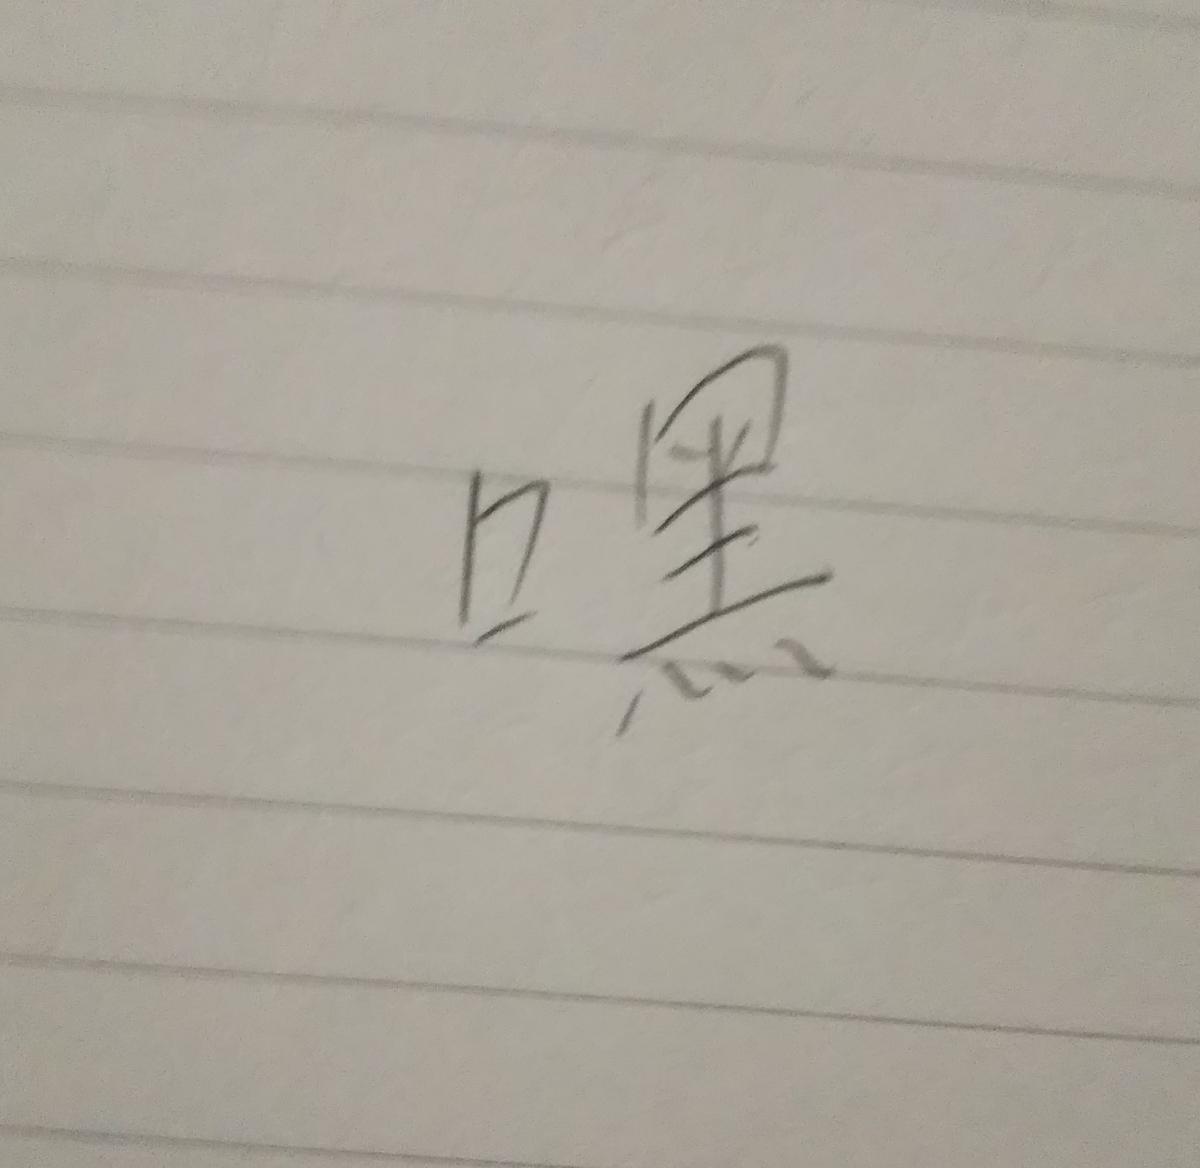 f:id:sakamotoakirax:20191229055302j:plain